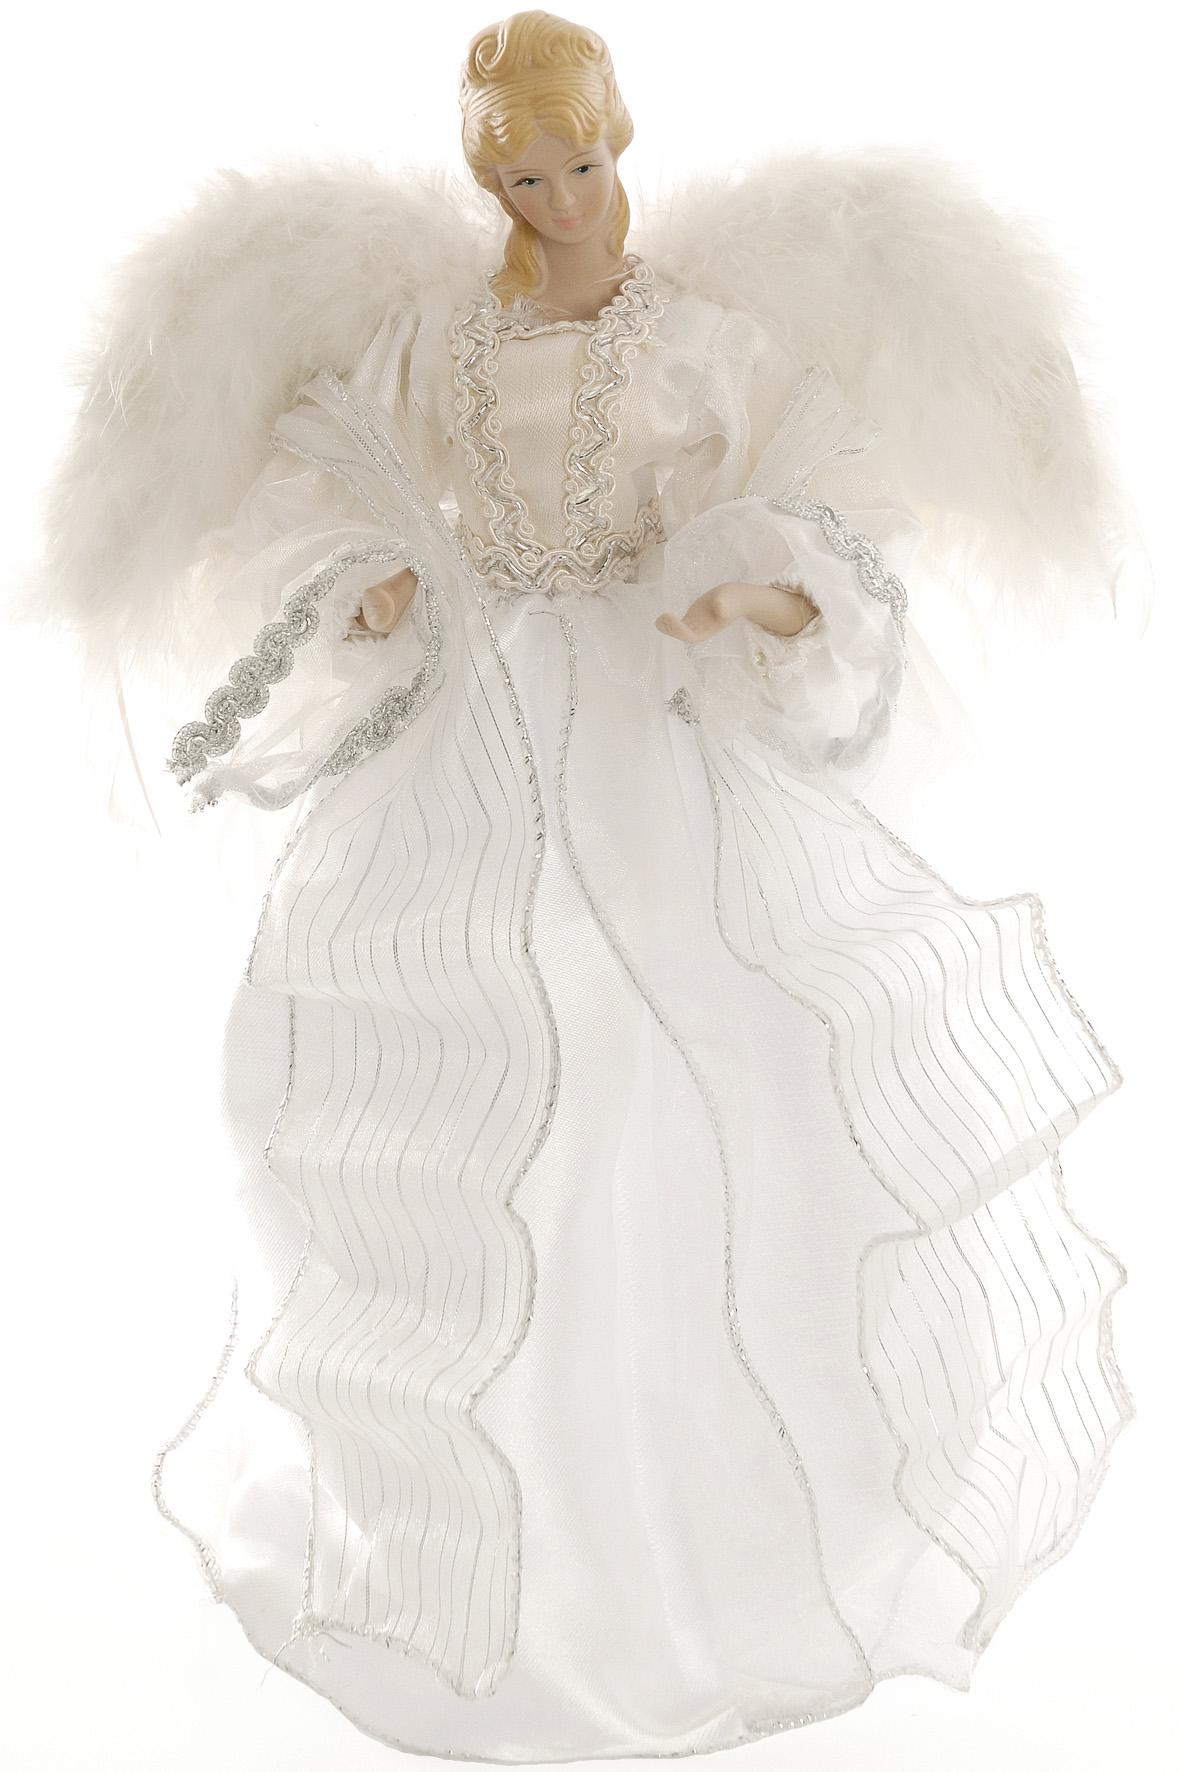 Blanc argent f e ange sapin de no l cantonni re d coration style vintage plumes ebay - Ange sapin noel ...